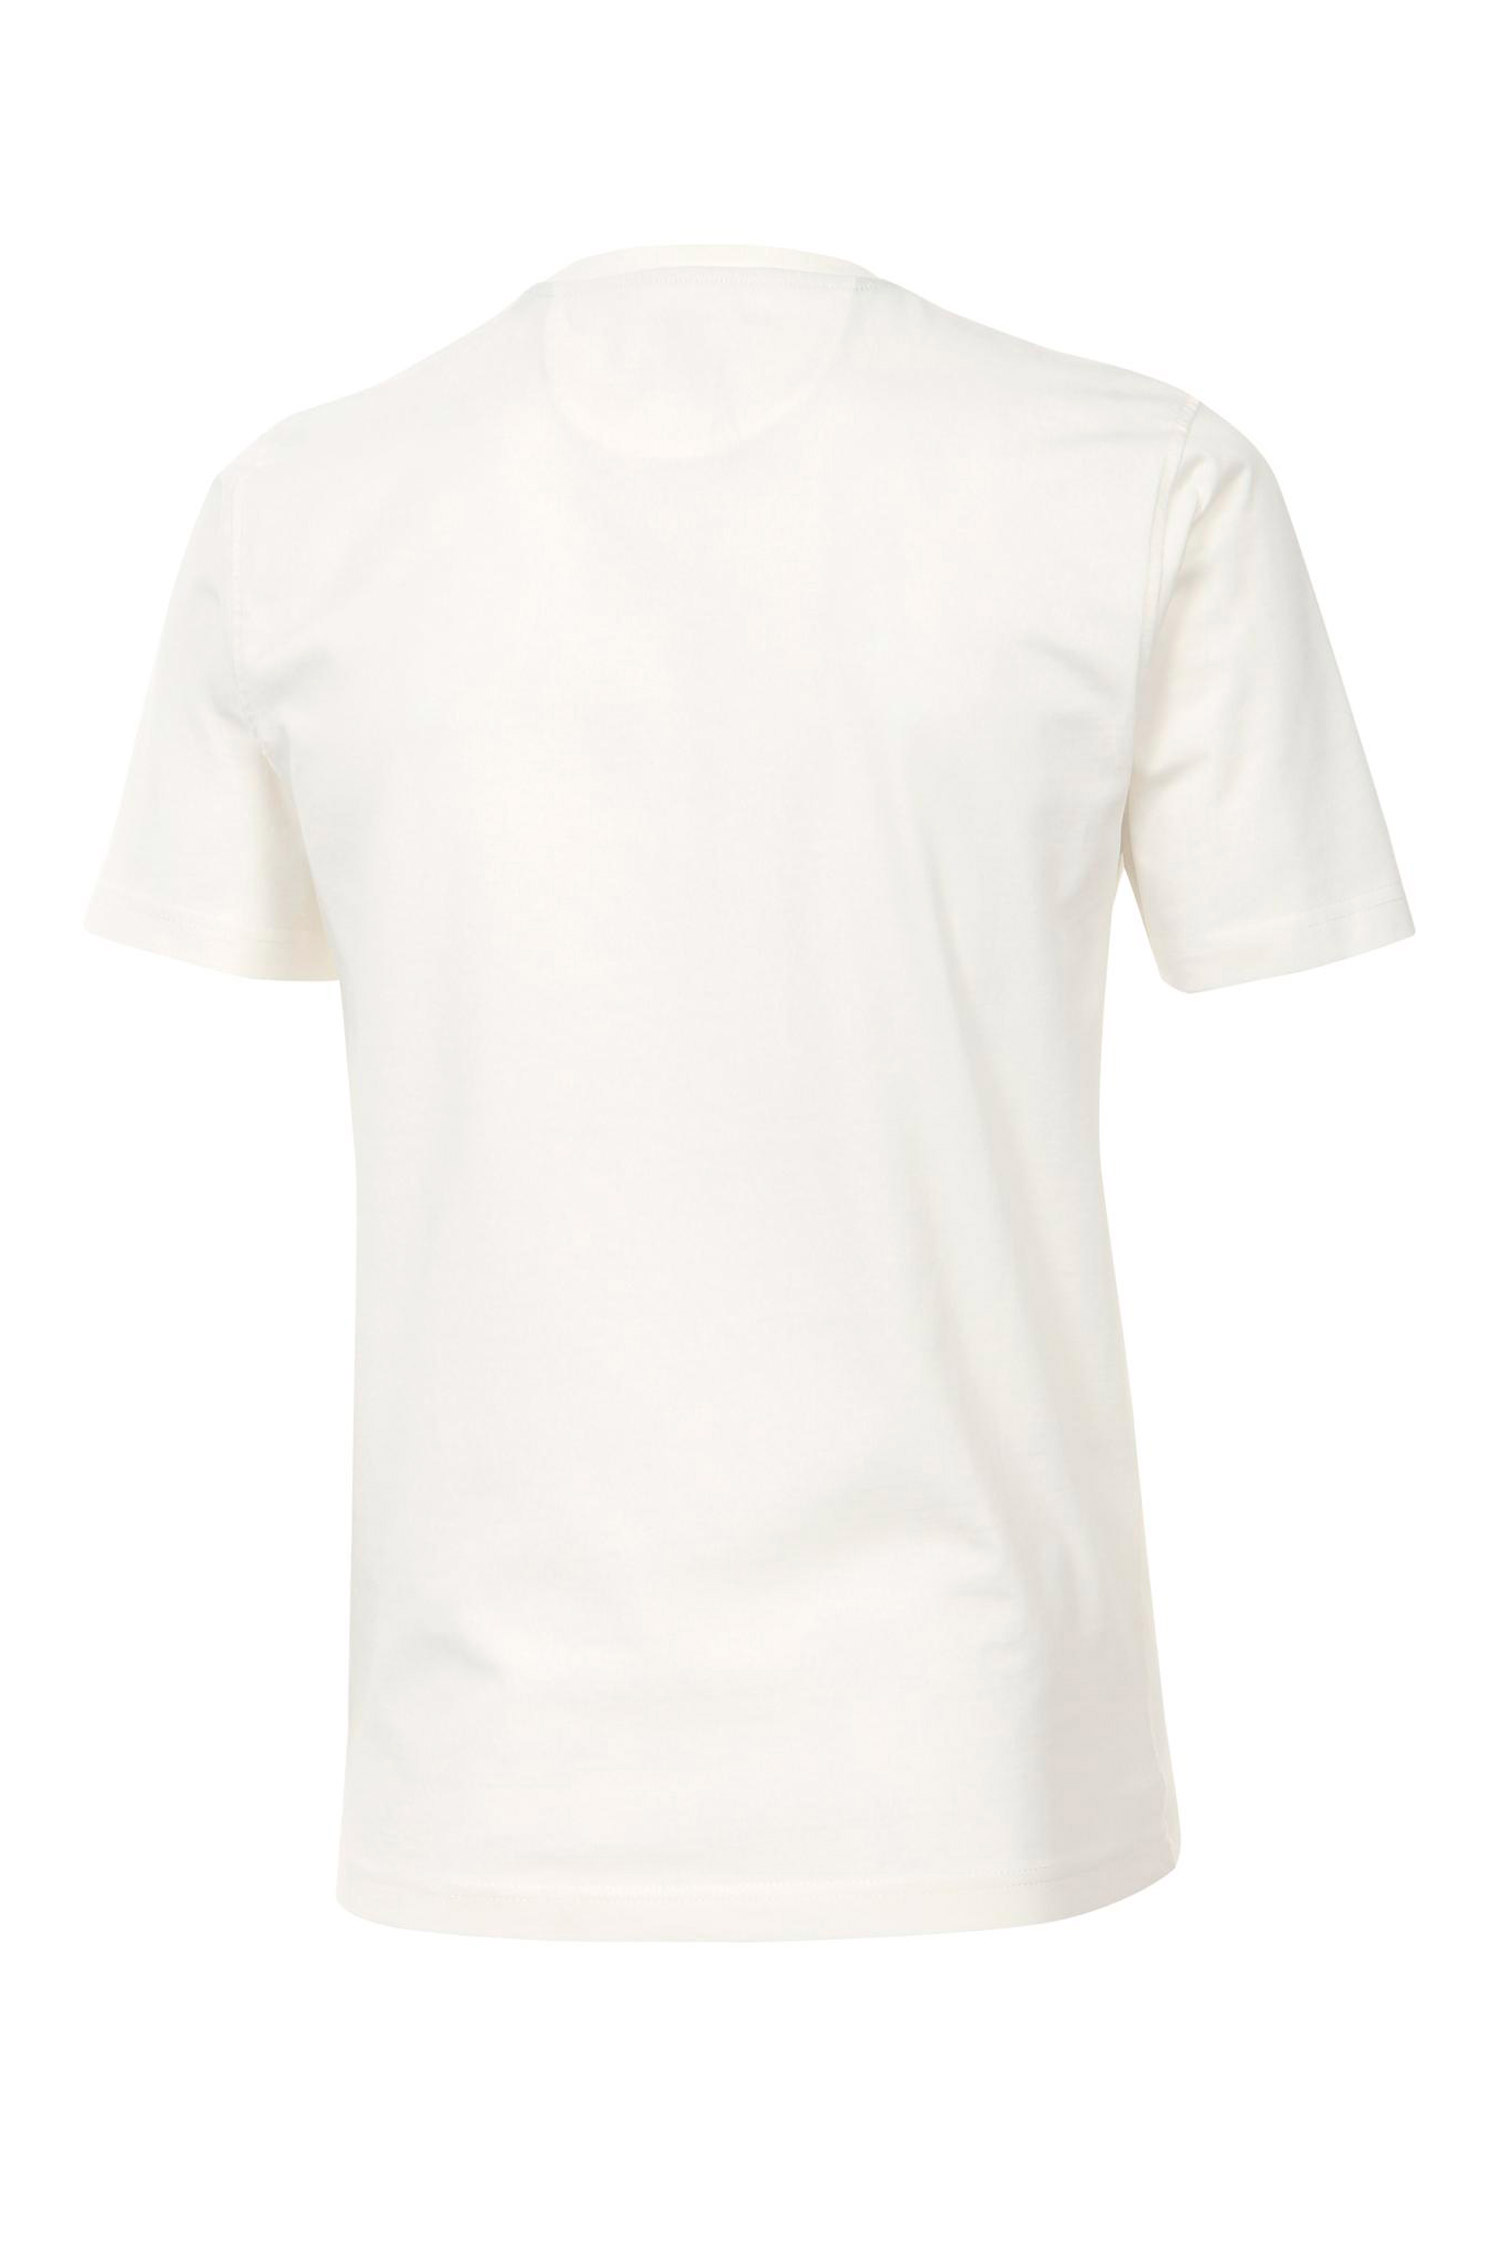 Sport, Camisetas M. Corta, 109498, BLANCO | Zoom